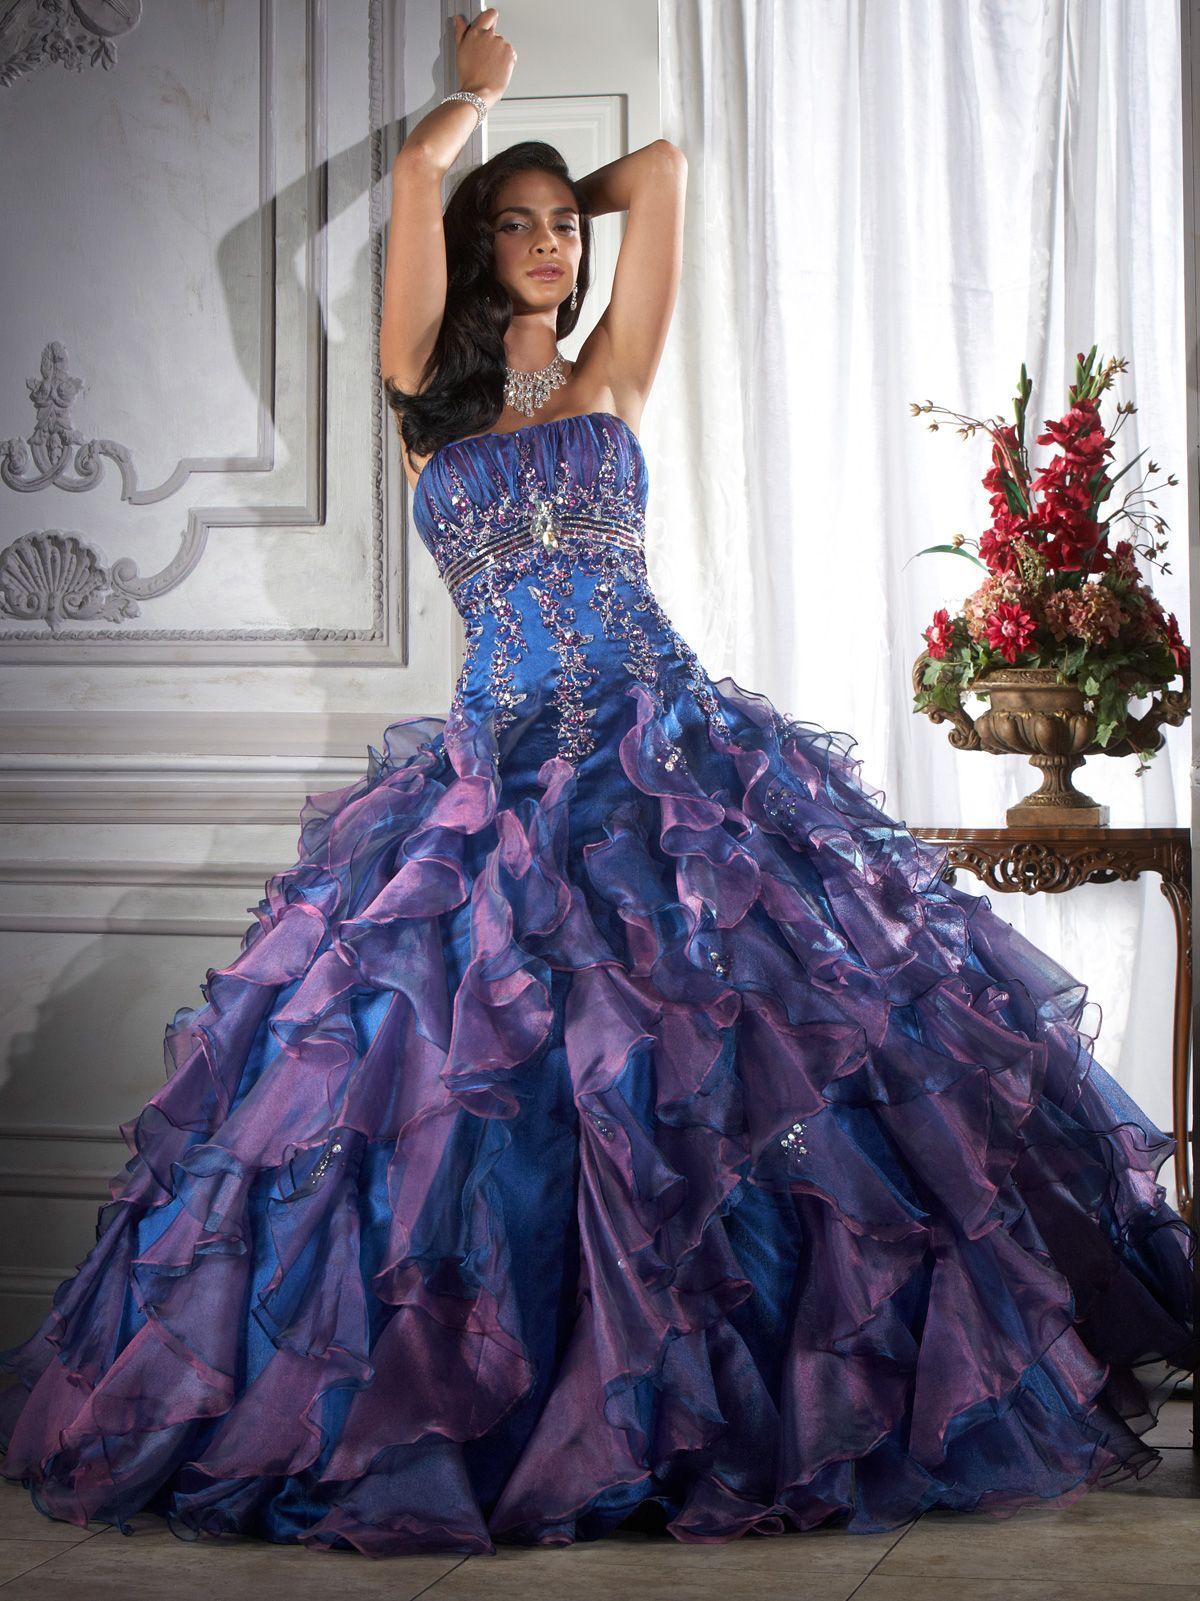 Medium Crop Of Purple Wedding Dress